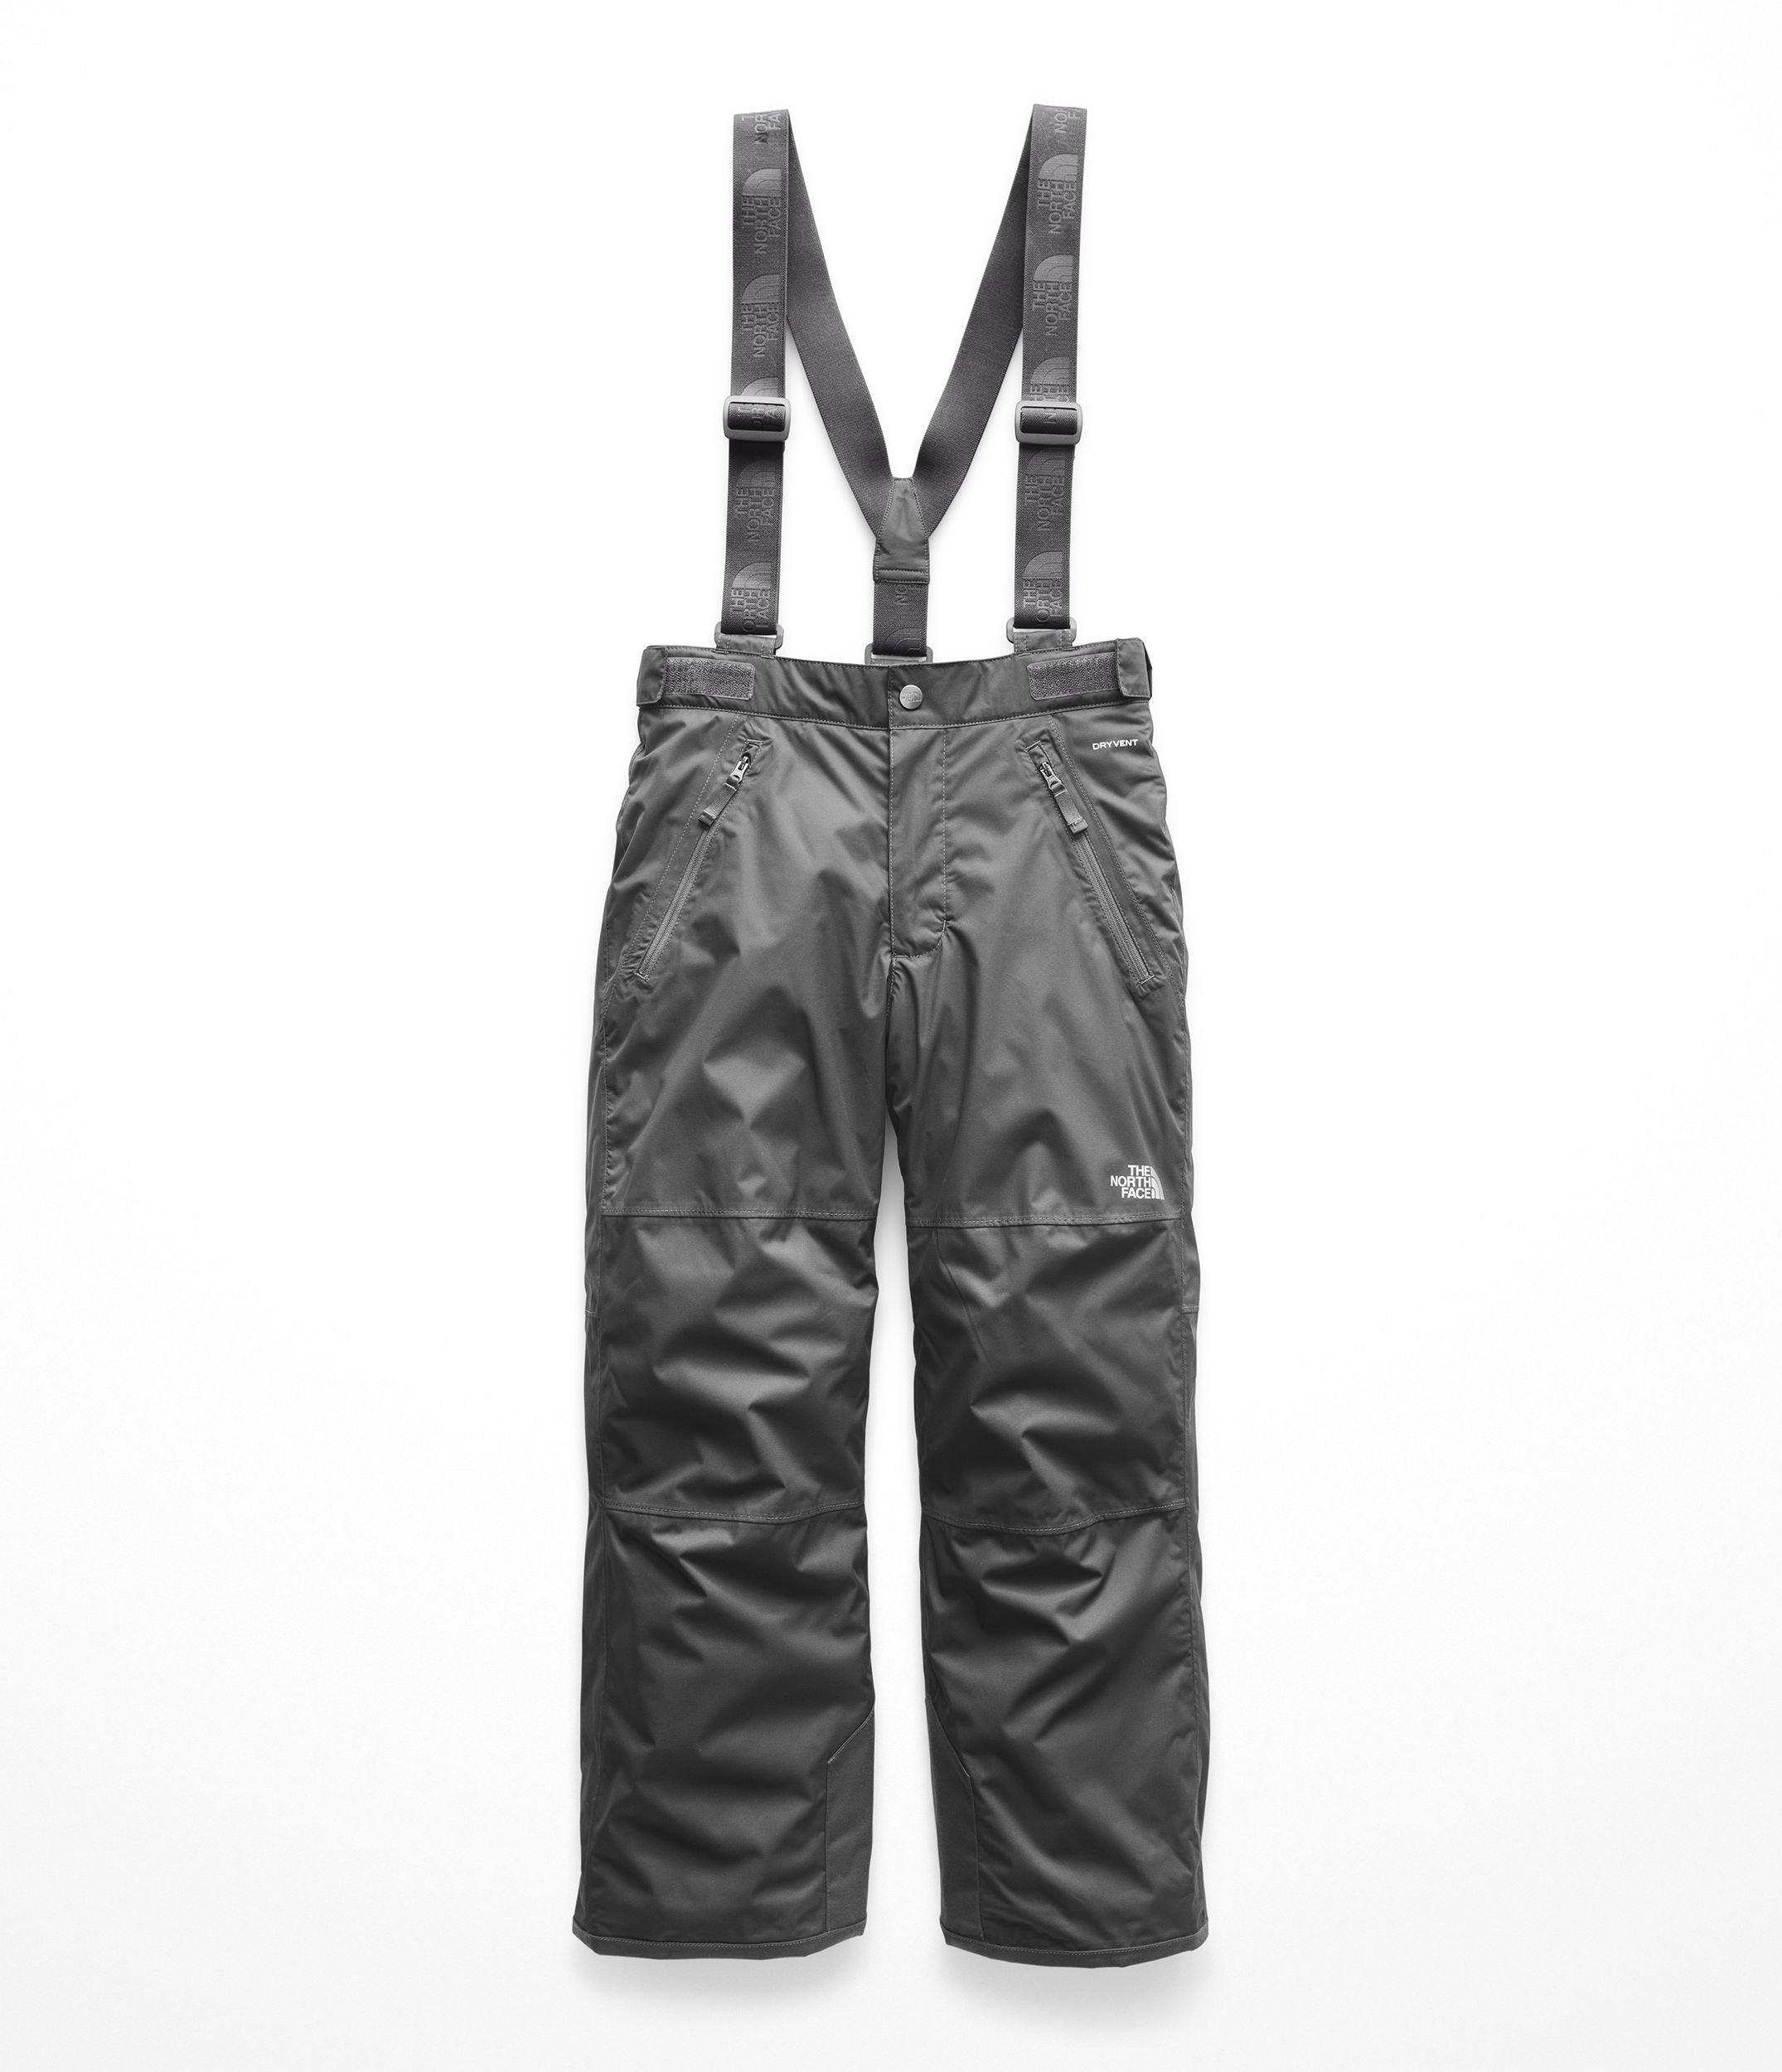 The North Face Kids Boy's Snowquest Suspender Plus Pants (Little Kids/Big Kids) Graphite Grey Small